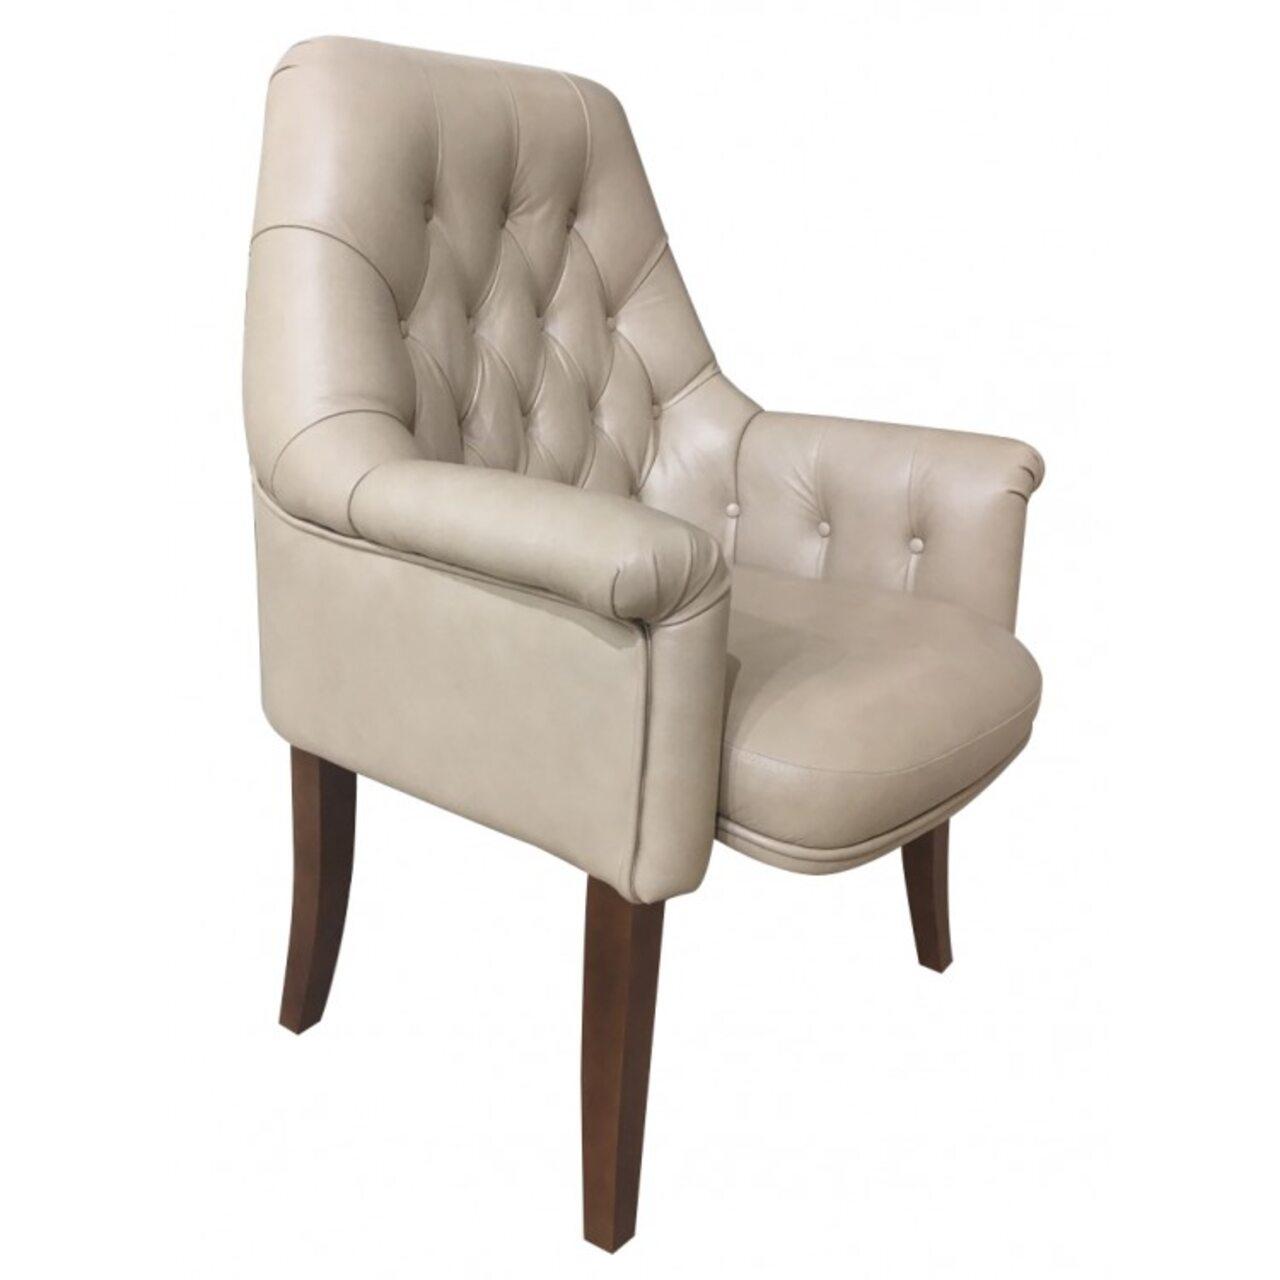 Классический стул Бруно-G - фото 1